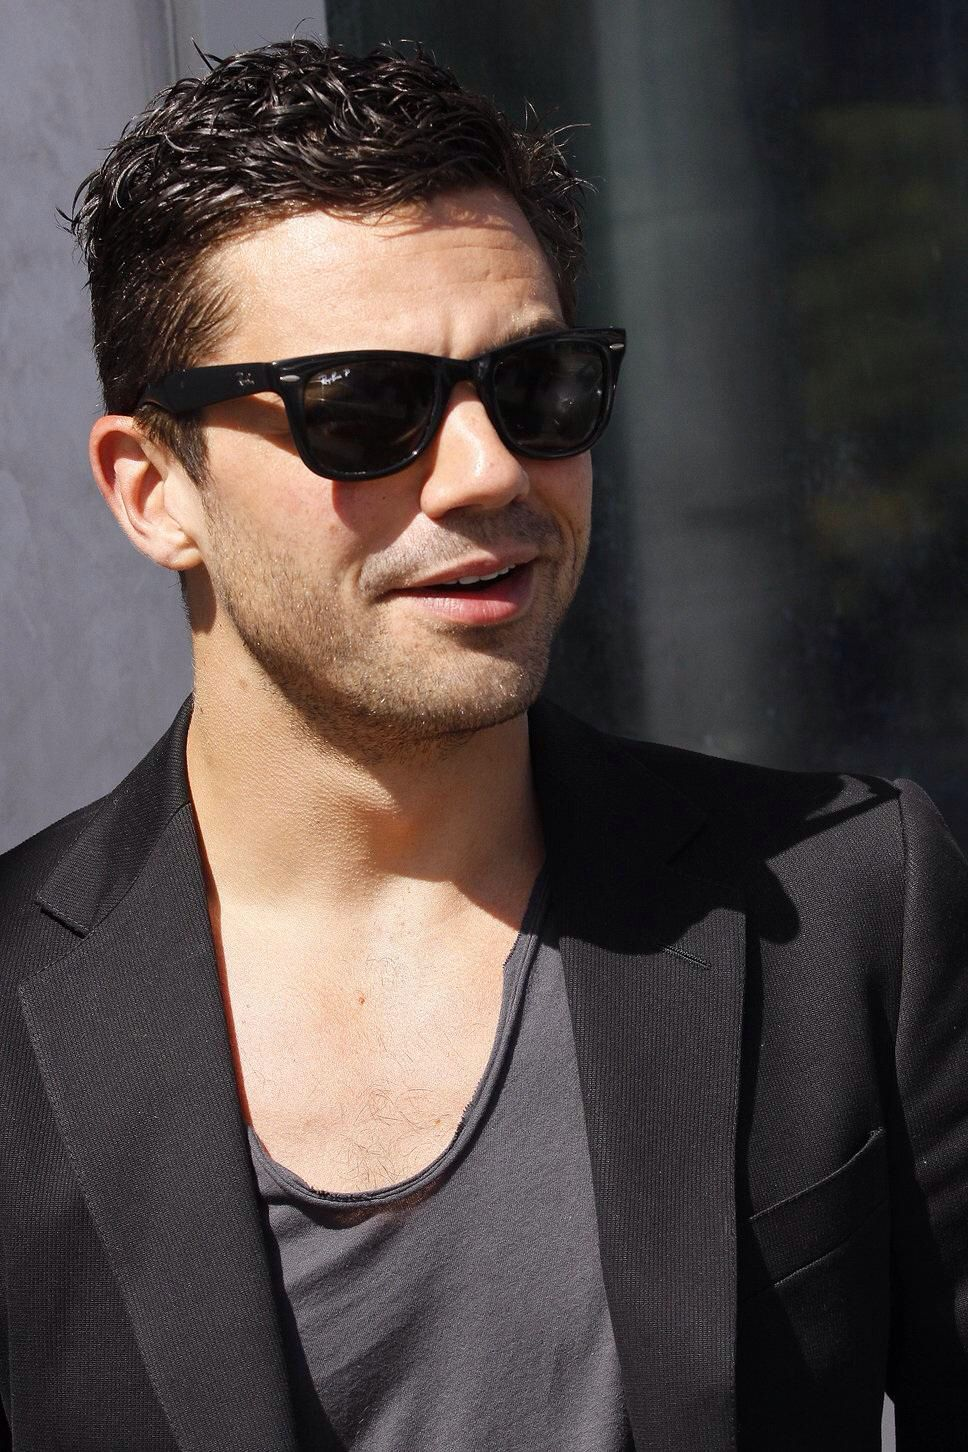 96cd9af6adbd Dominic Cooper fansshare.com Police Sunglasses, Tom Ford Sunglasses,  Wayfarer Sunglasses, Sports